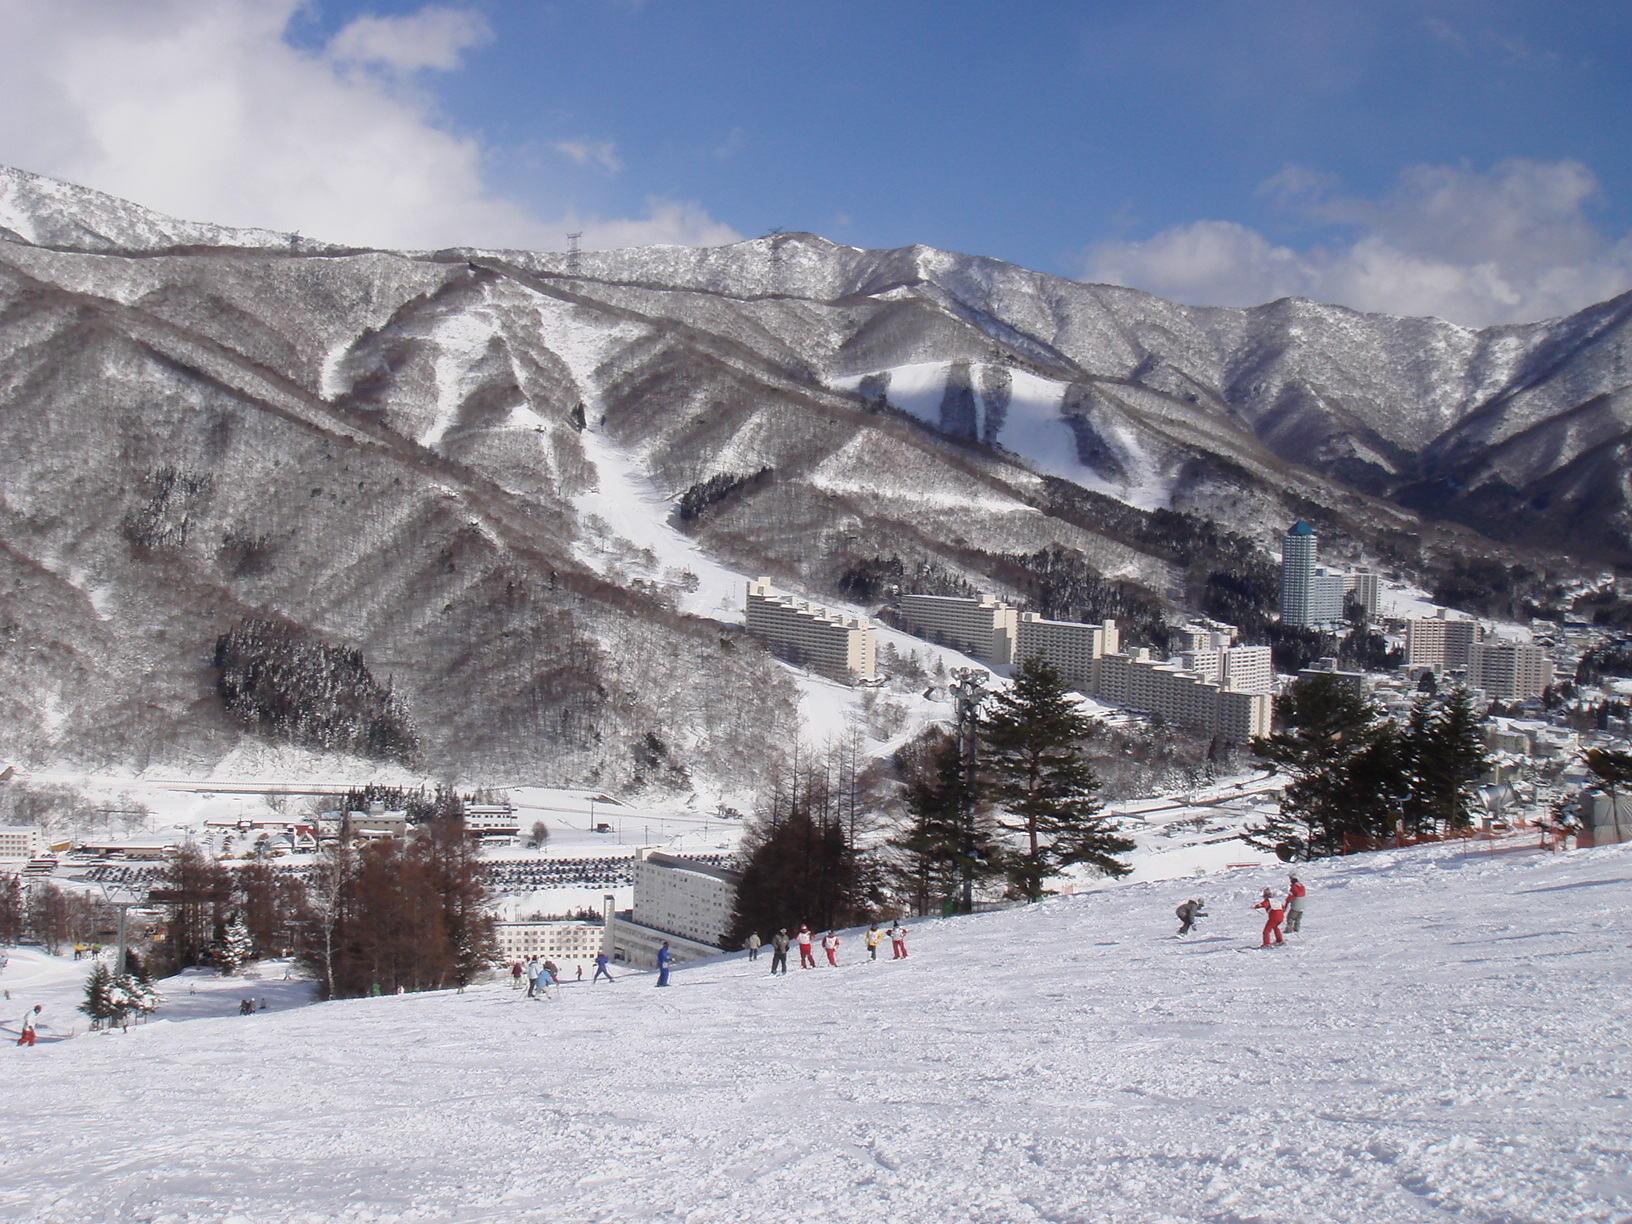 niigata senior singles Gala yuzawa - a ski resort in yuzawa town, niigata, japan - ski and snowboard resorts in japan - snowjapan.